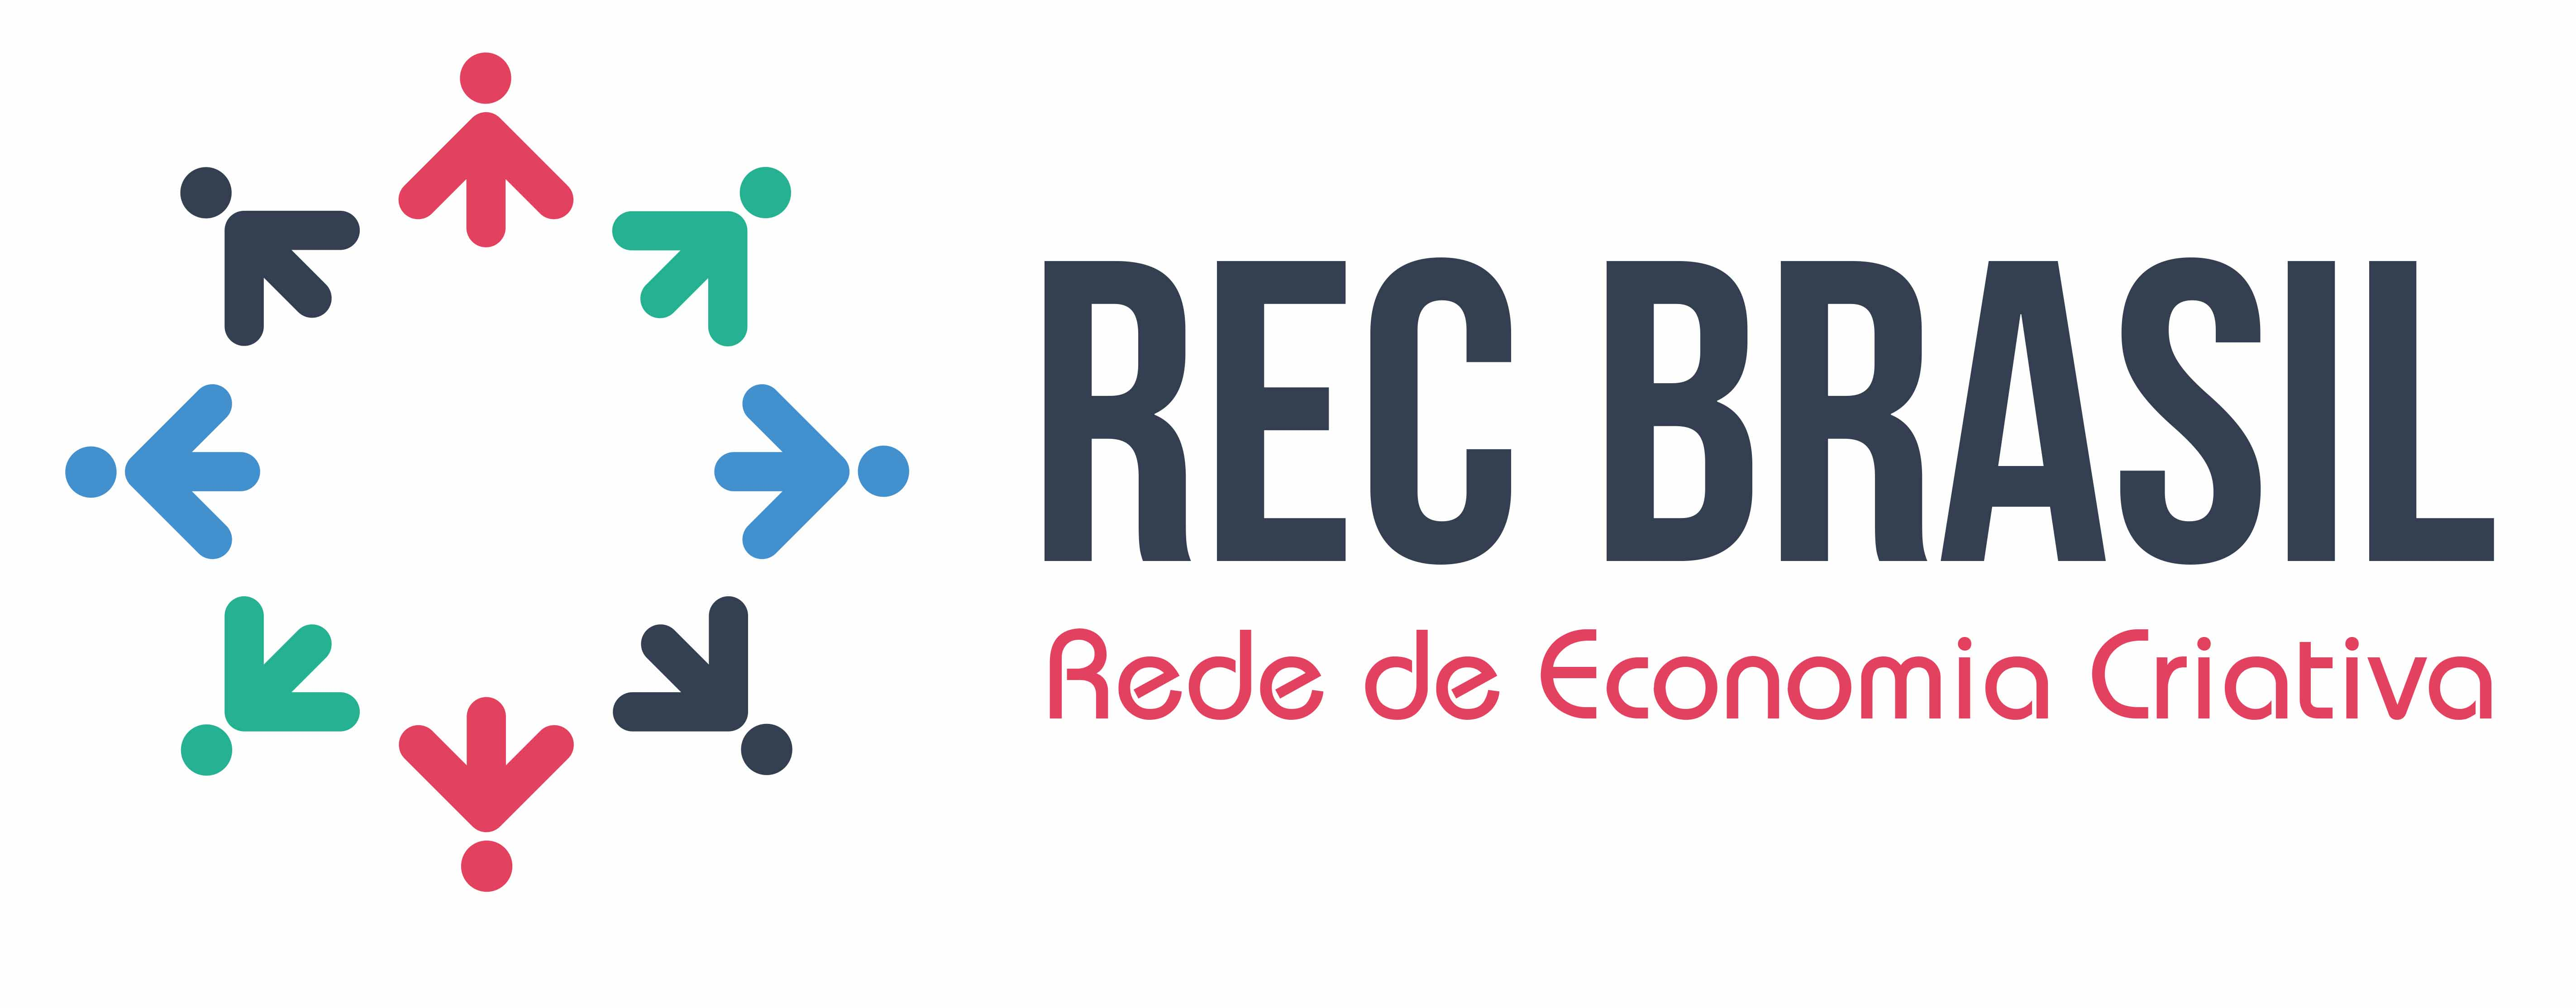 Rede de Economia Criativa – Brasil